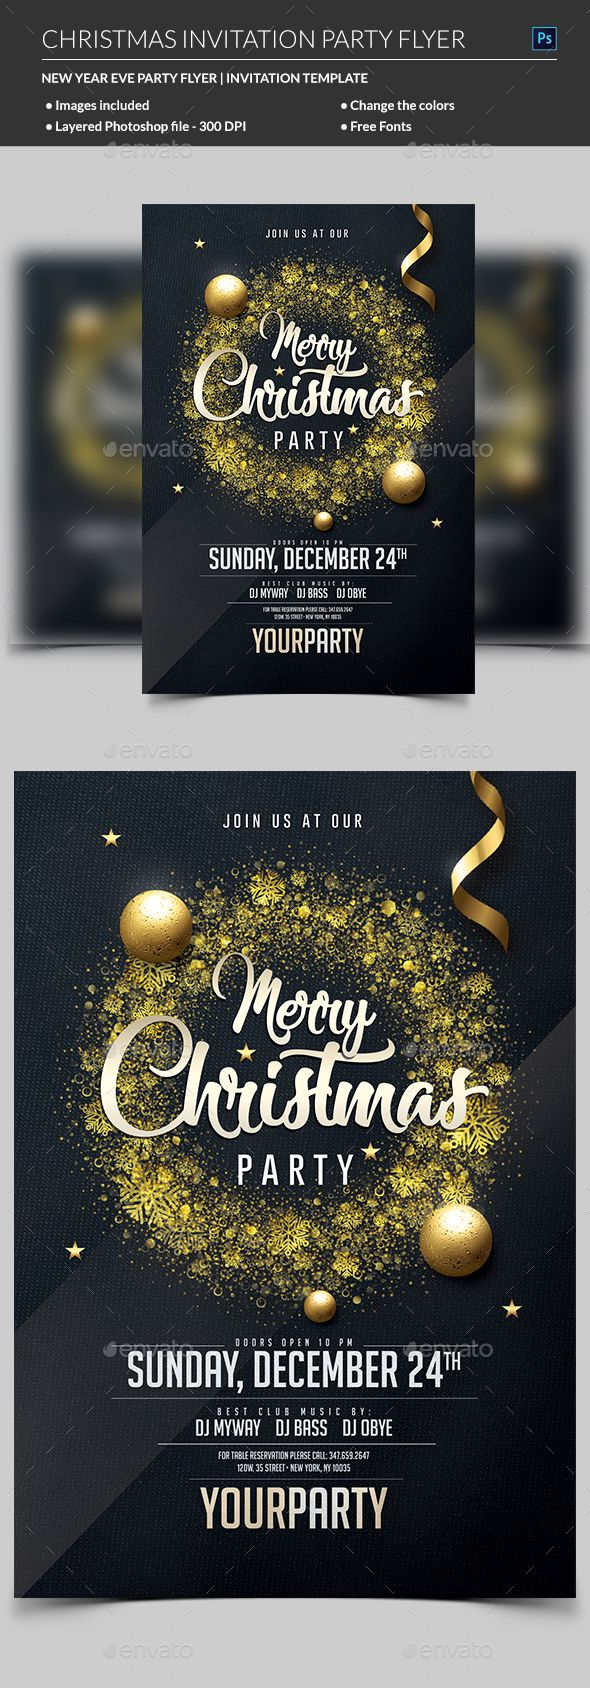 Christmas Party Invitation 258 best Flyer Ideas